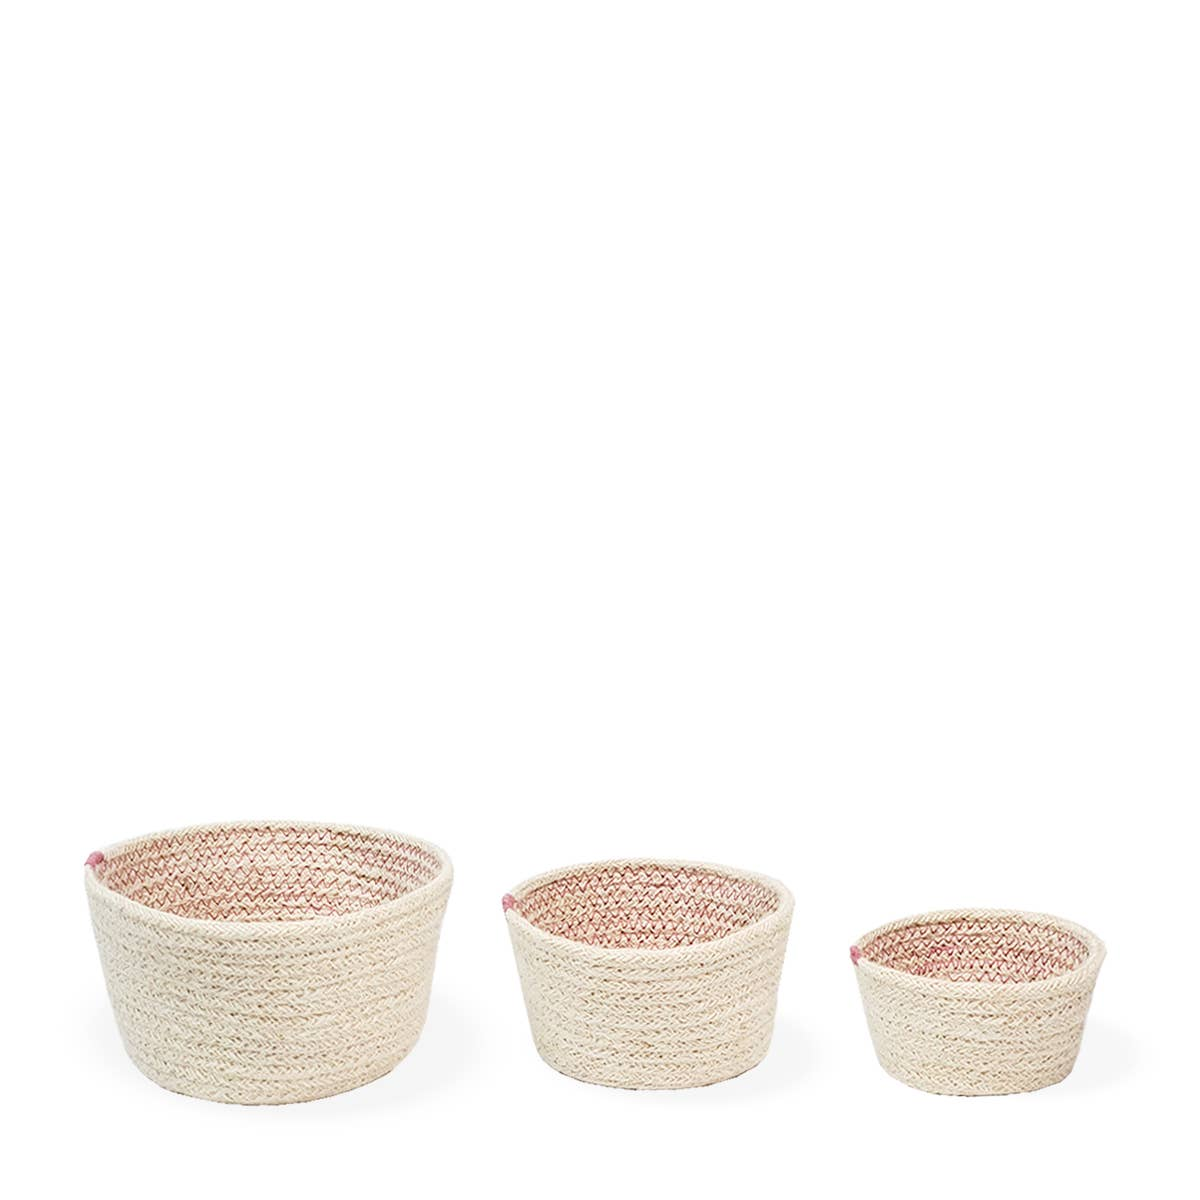 Amari Bowl - Pink (Set of 3)   Trada Marketplace